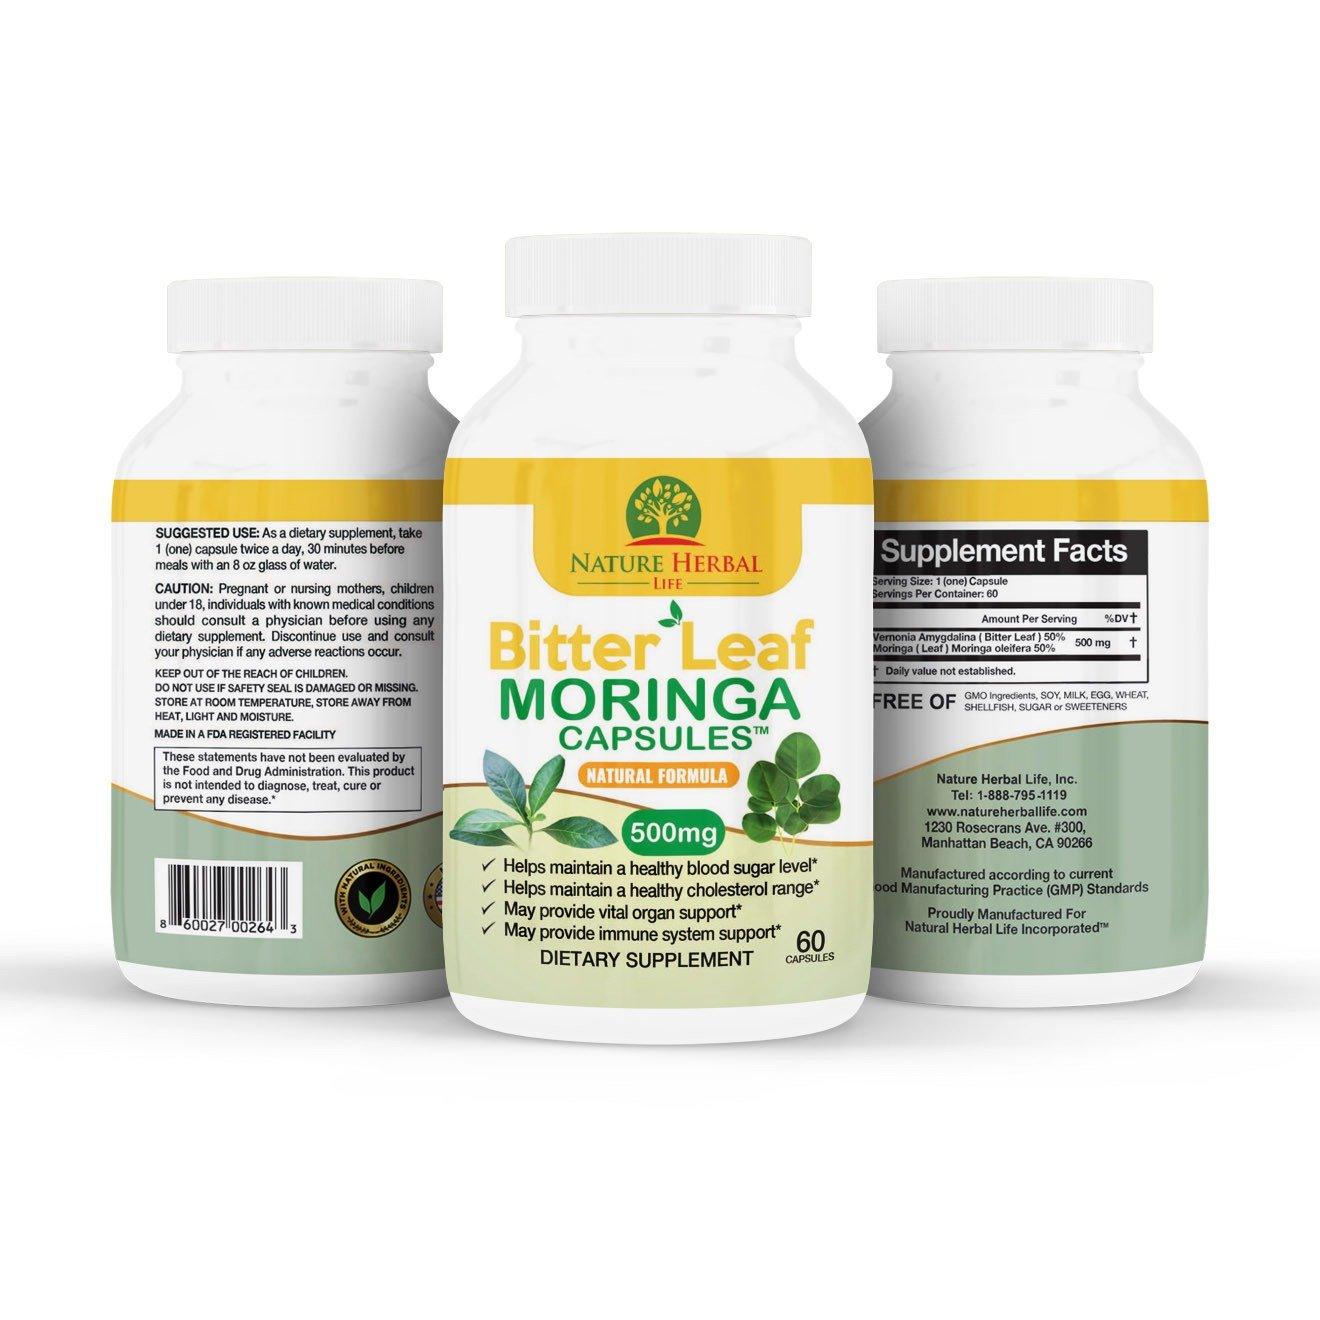 Bitter Leaf Moringa Capsule | capsules de Moringa à la feuille amère